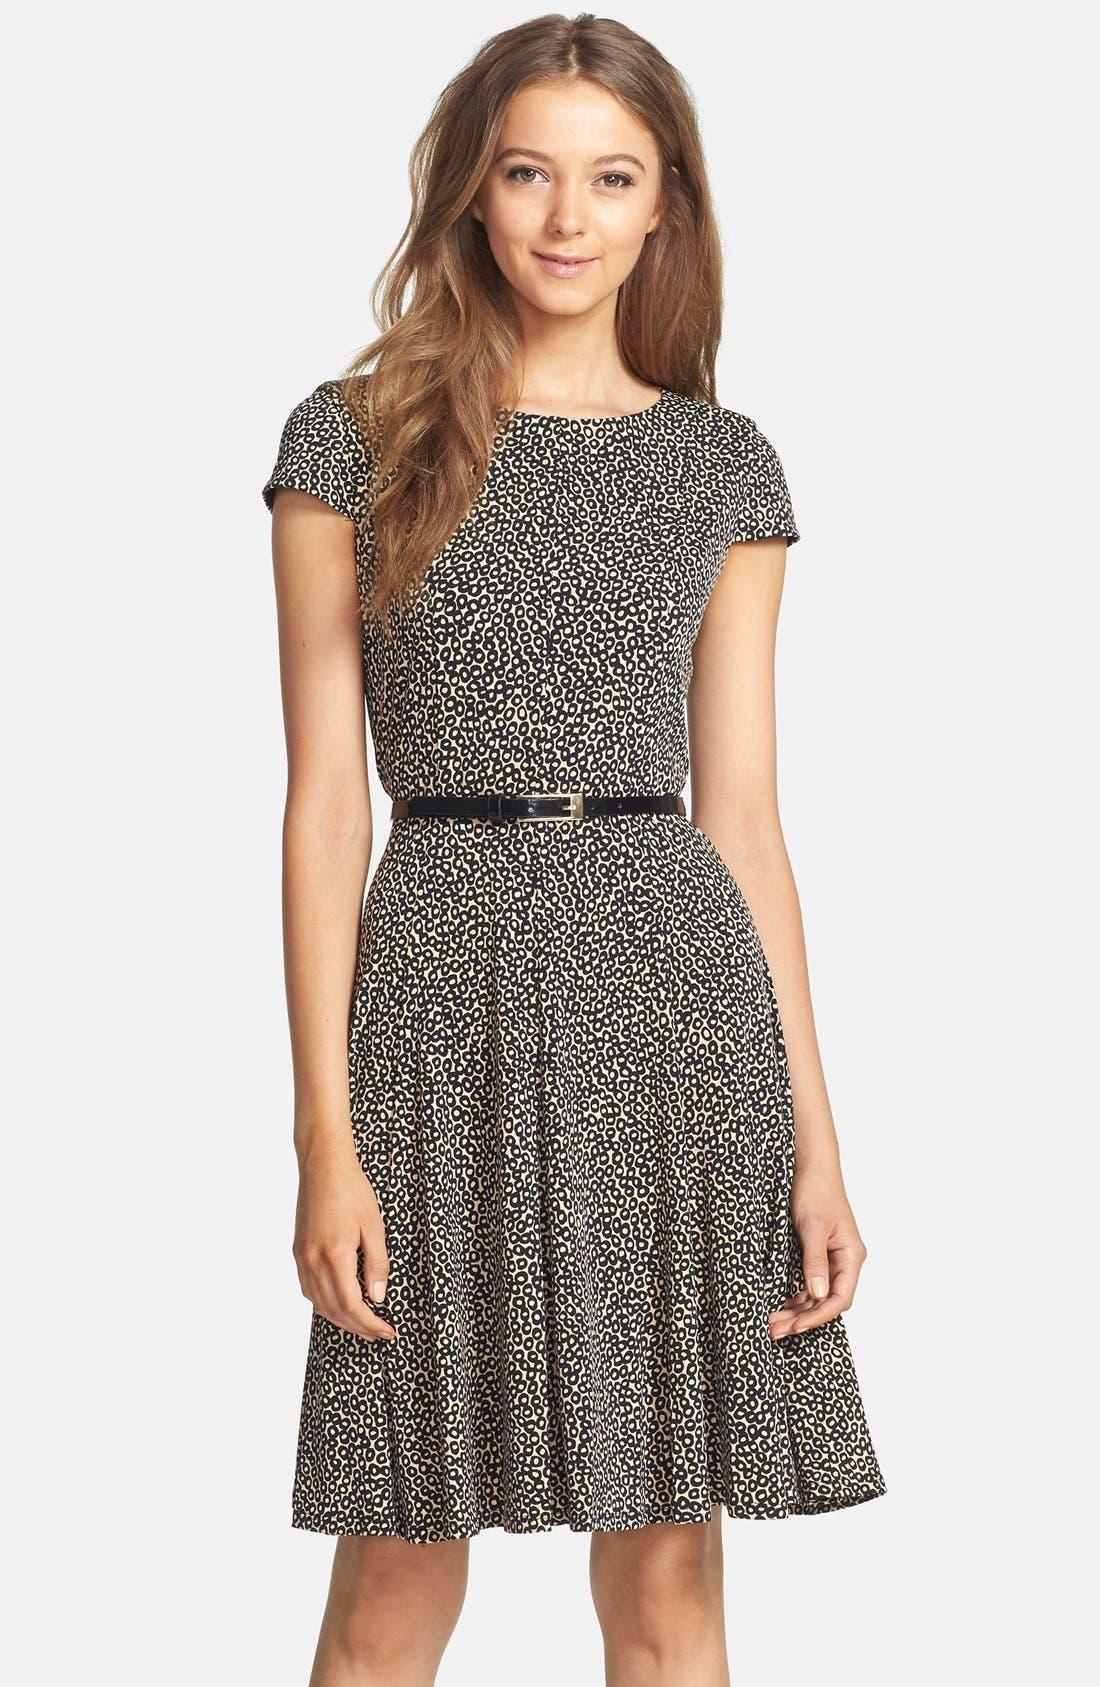 Alternate Image 1 Selected - Eliza J Print Belted Fit & Flare Dress (Petite)